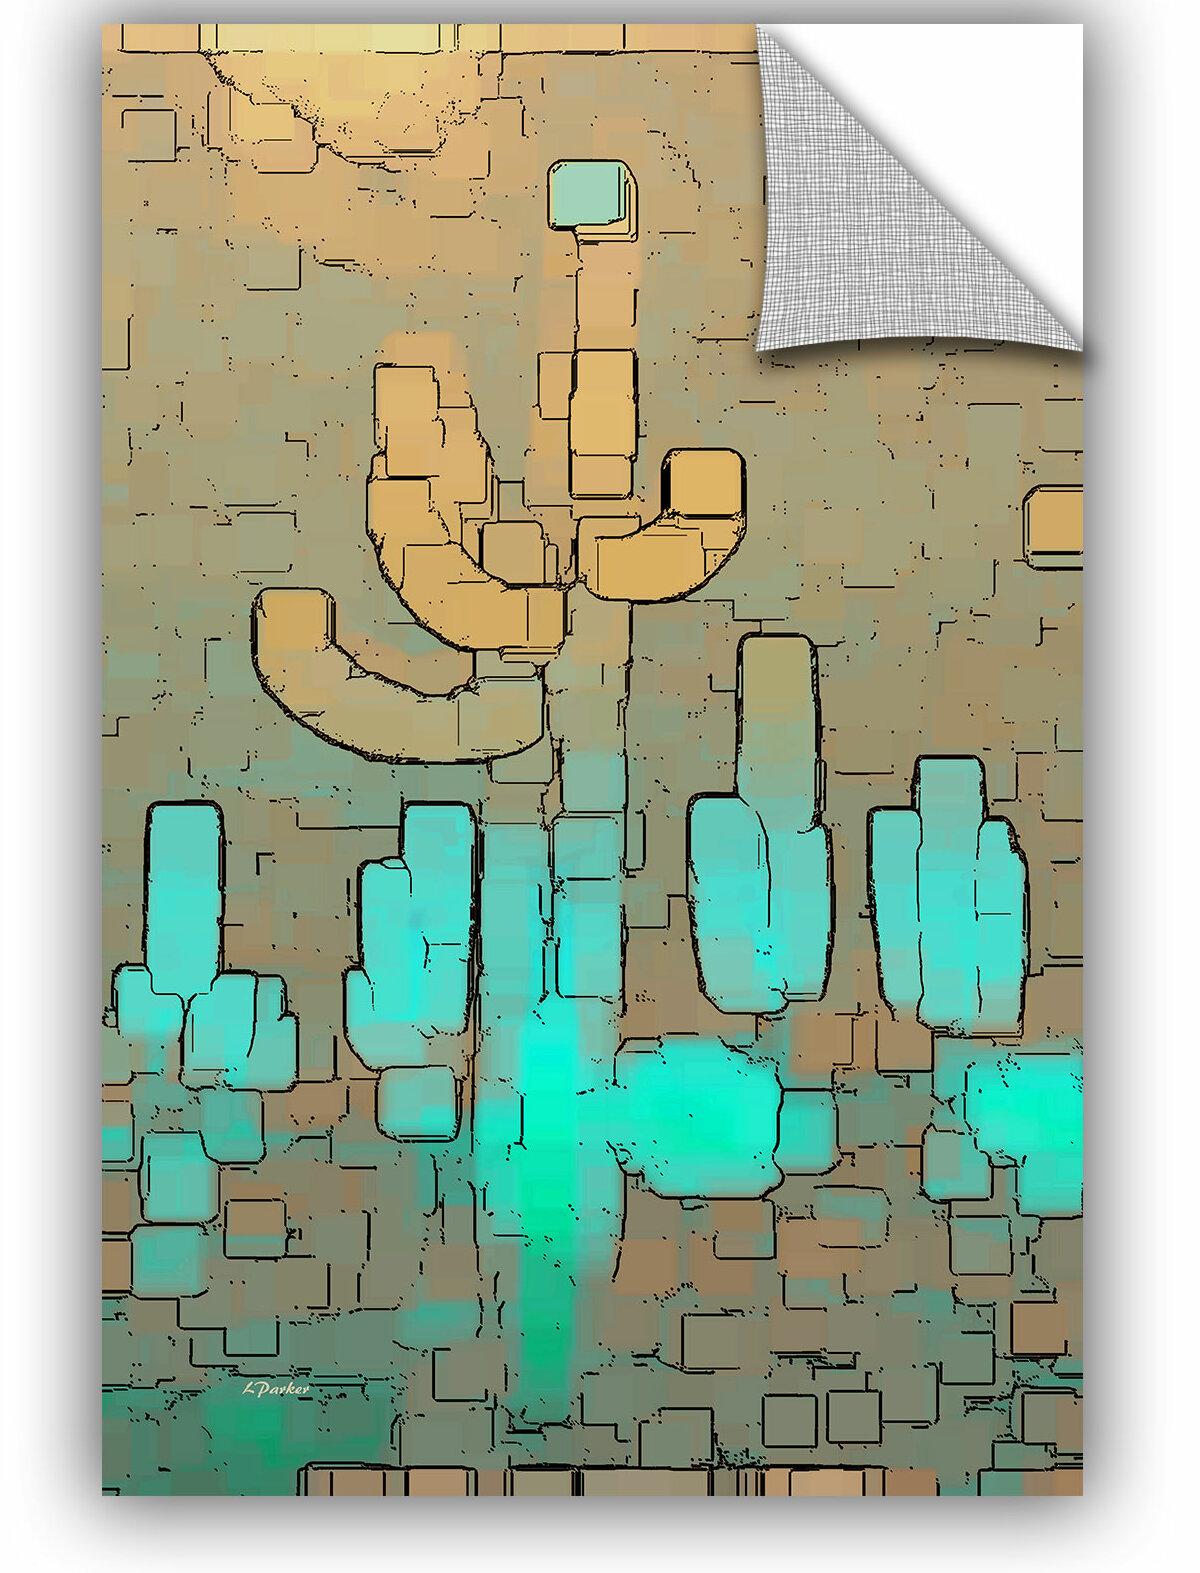 Elana Rays Cyan Swirl Art Appeelz Removable Graphic Wall Art 24 x 24